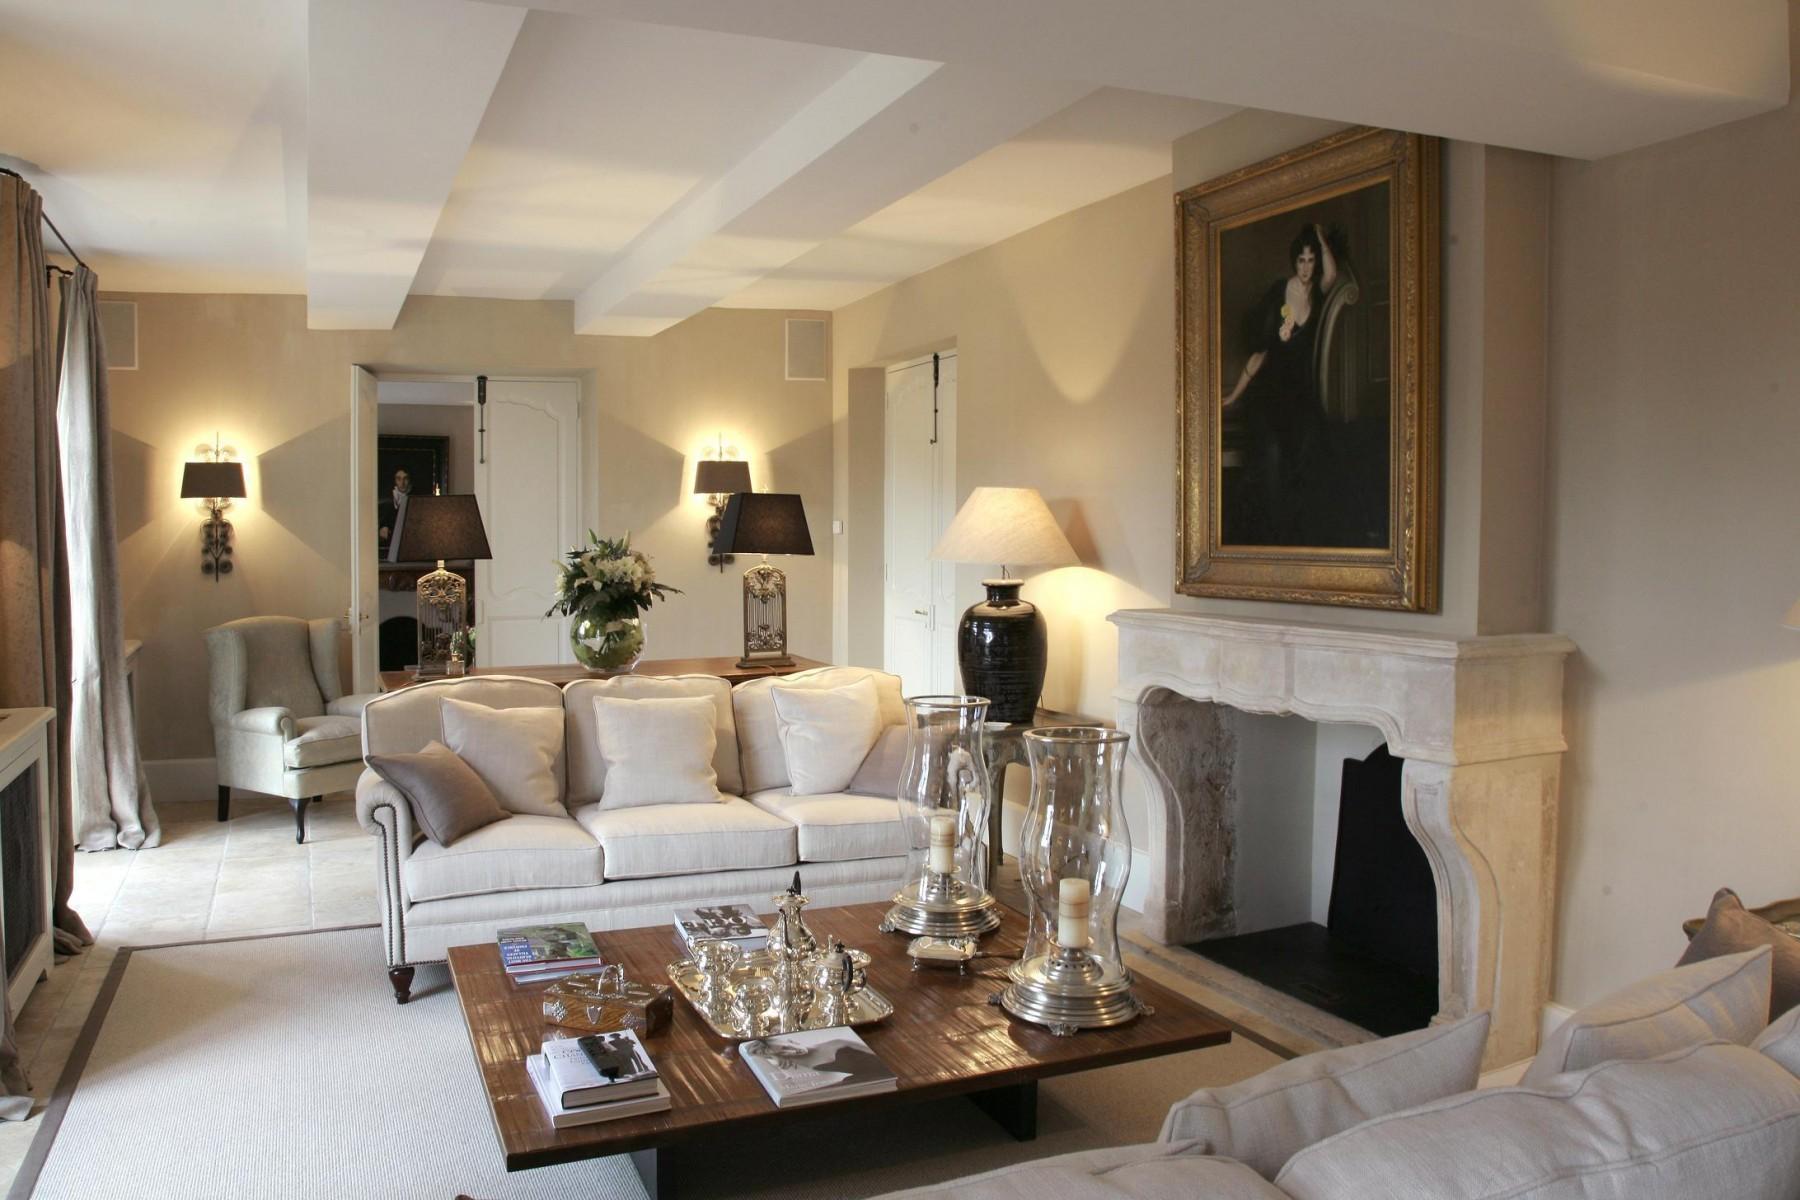 10 trucos para crear casas lujosas con poco dinero hoy Casas modernas interiores decoracion